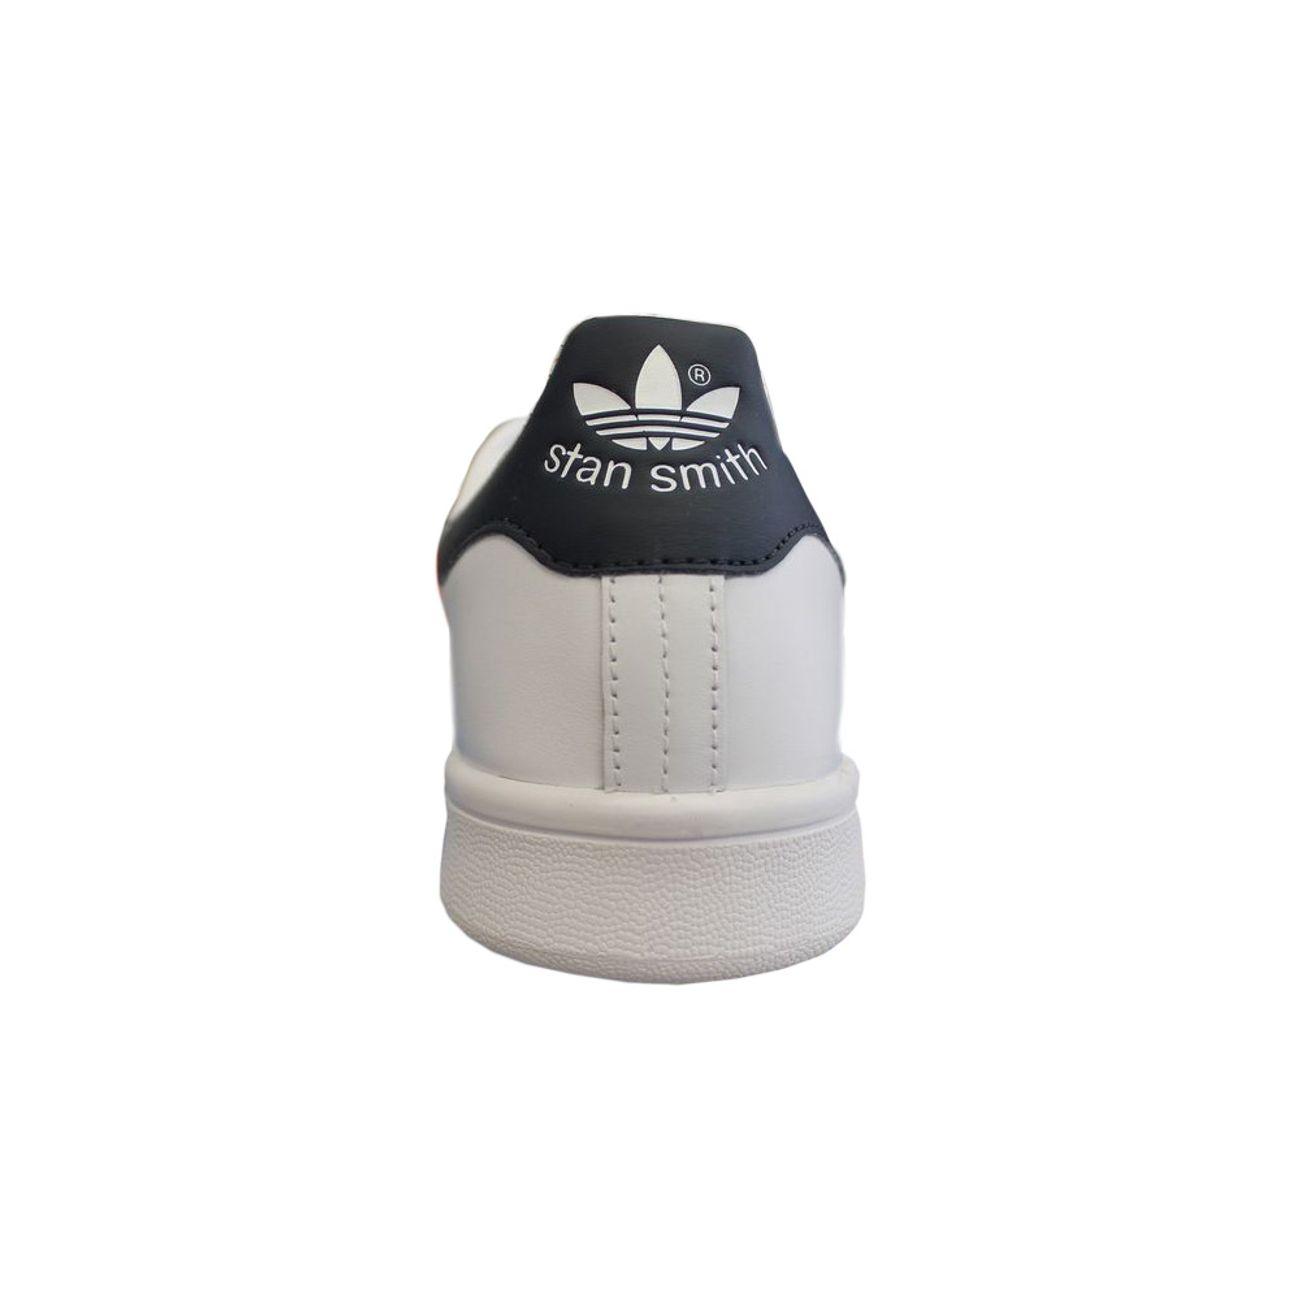 Adidas Smith Adulte Basket M20325 Outdoor Originals Stan Mode CBoWrdxe